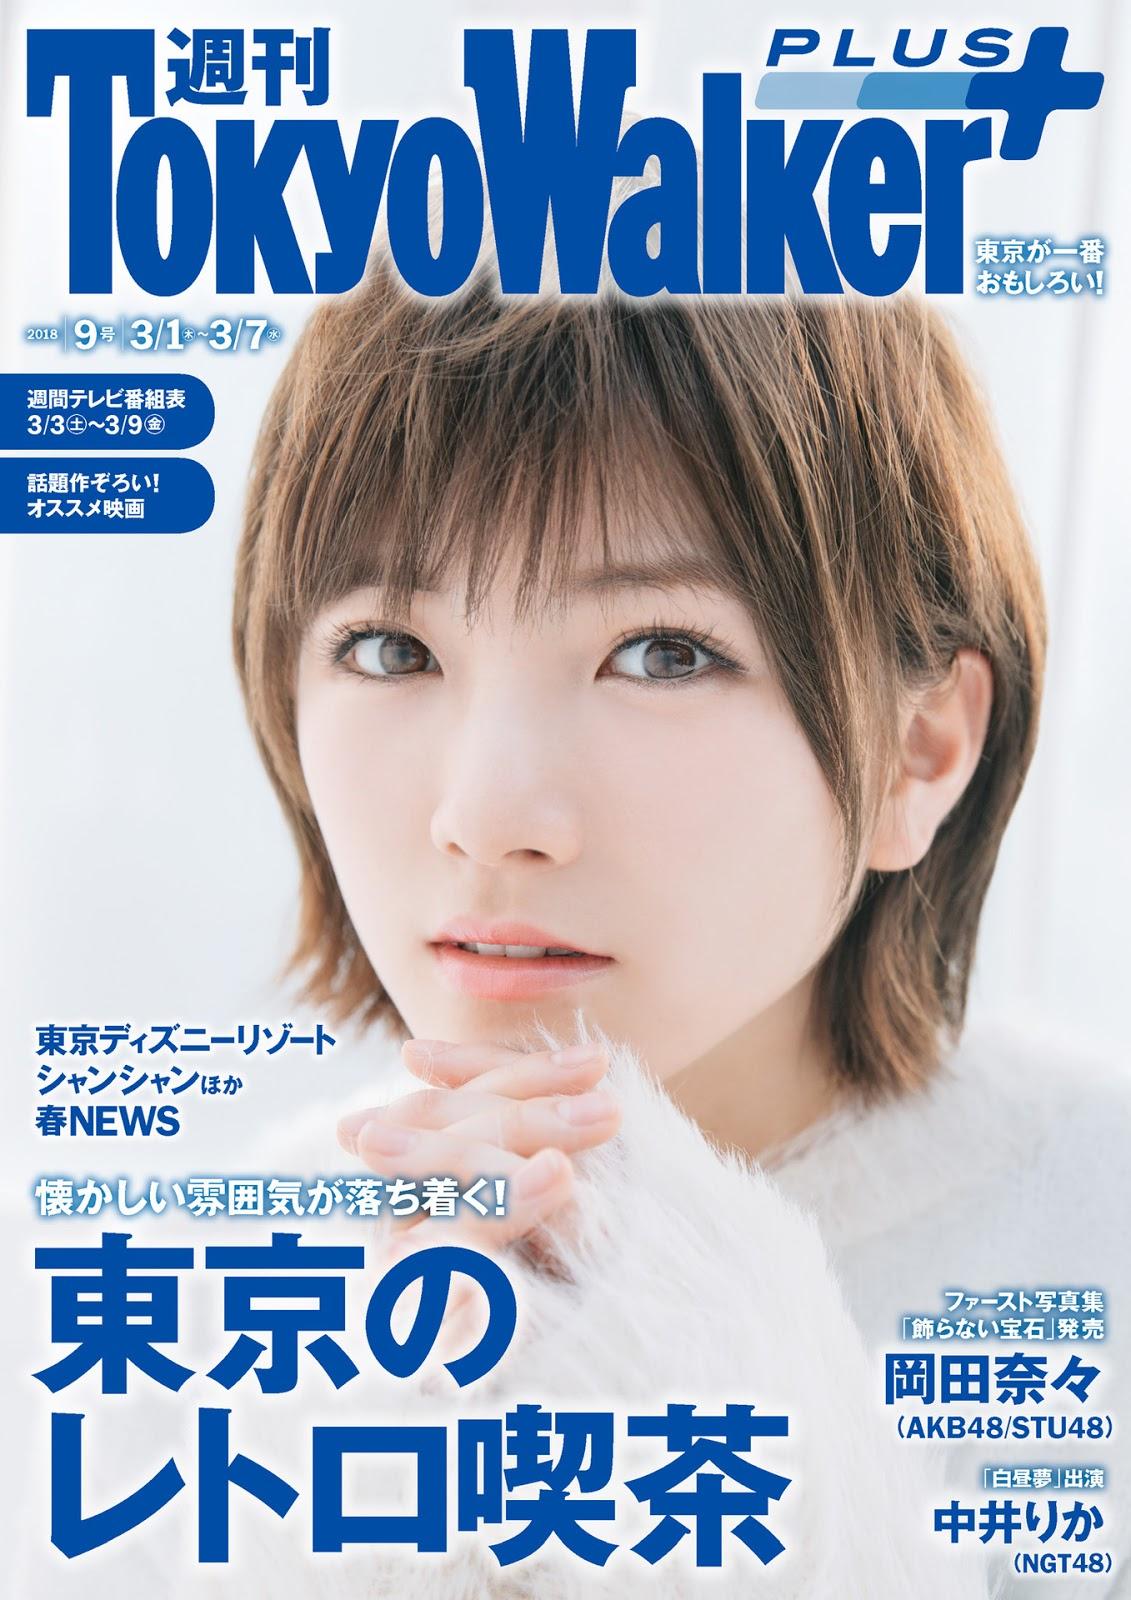 Okada Nana 岡田奈々, Tokyo walker 2018.02.28 No.09 (週刊東京ウォーカー+ 2018年9号)